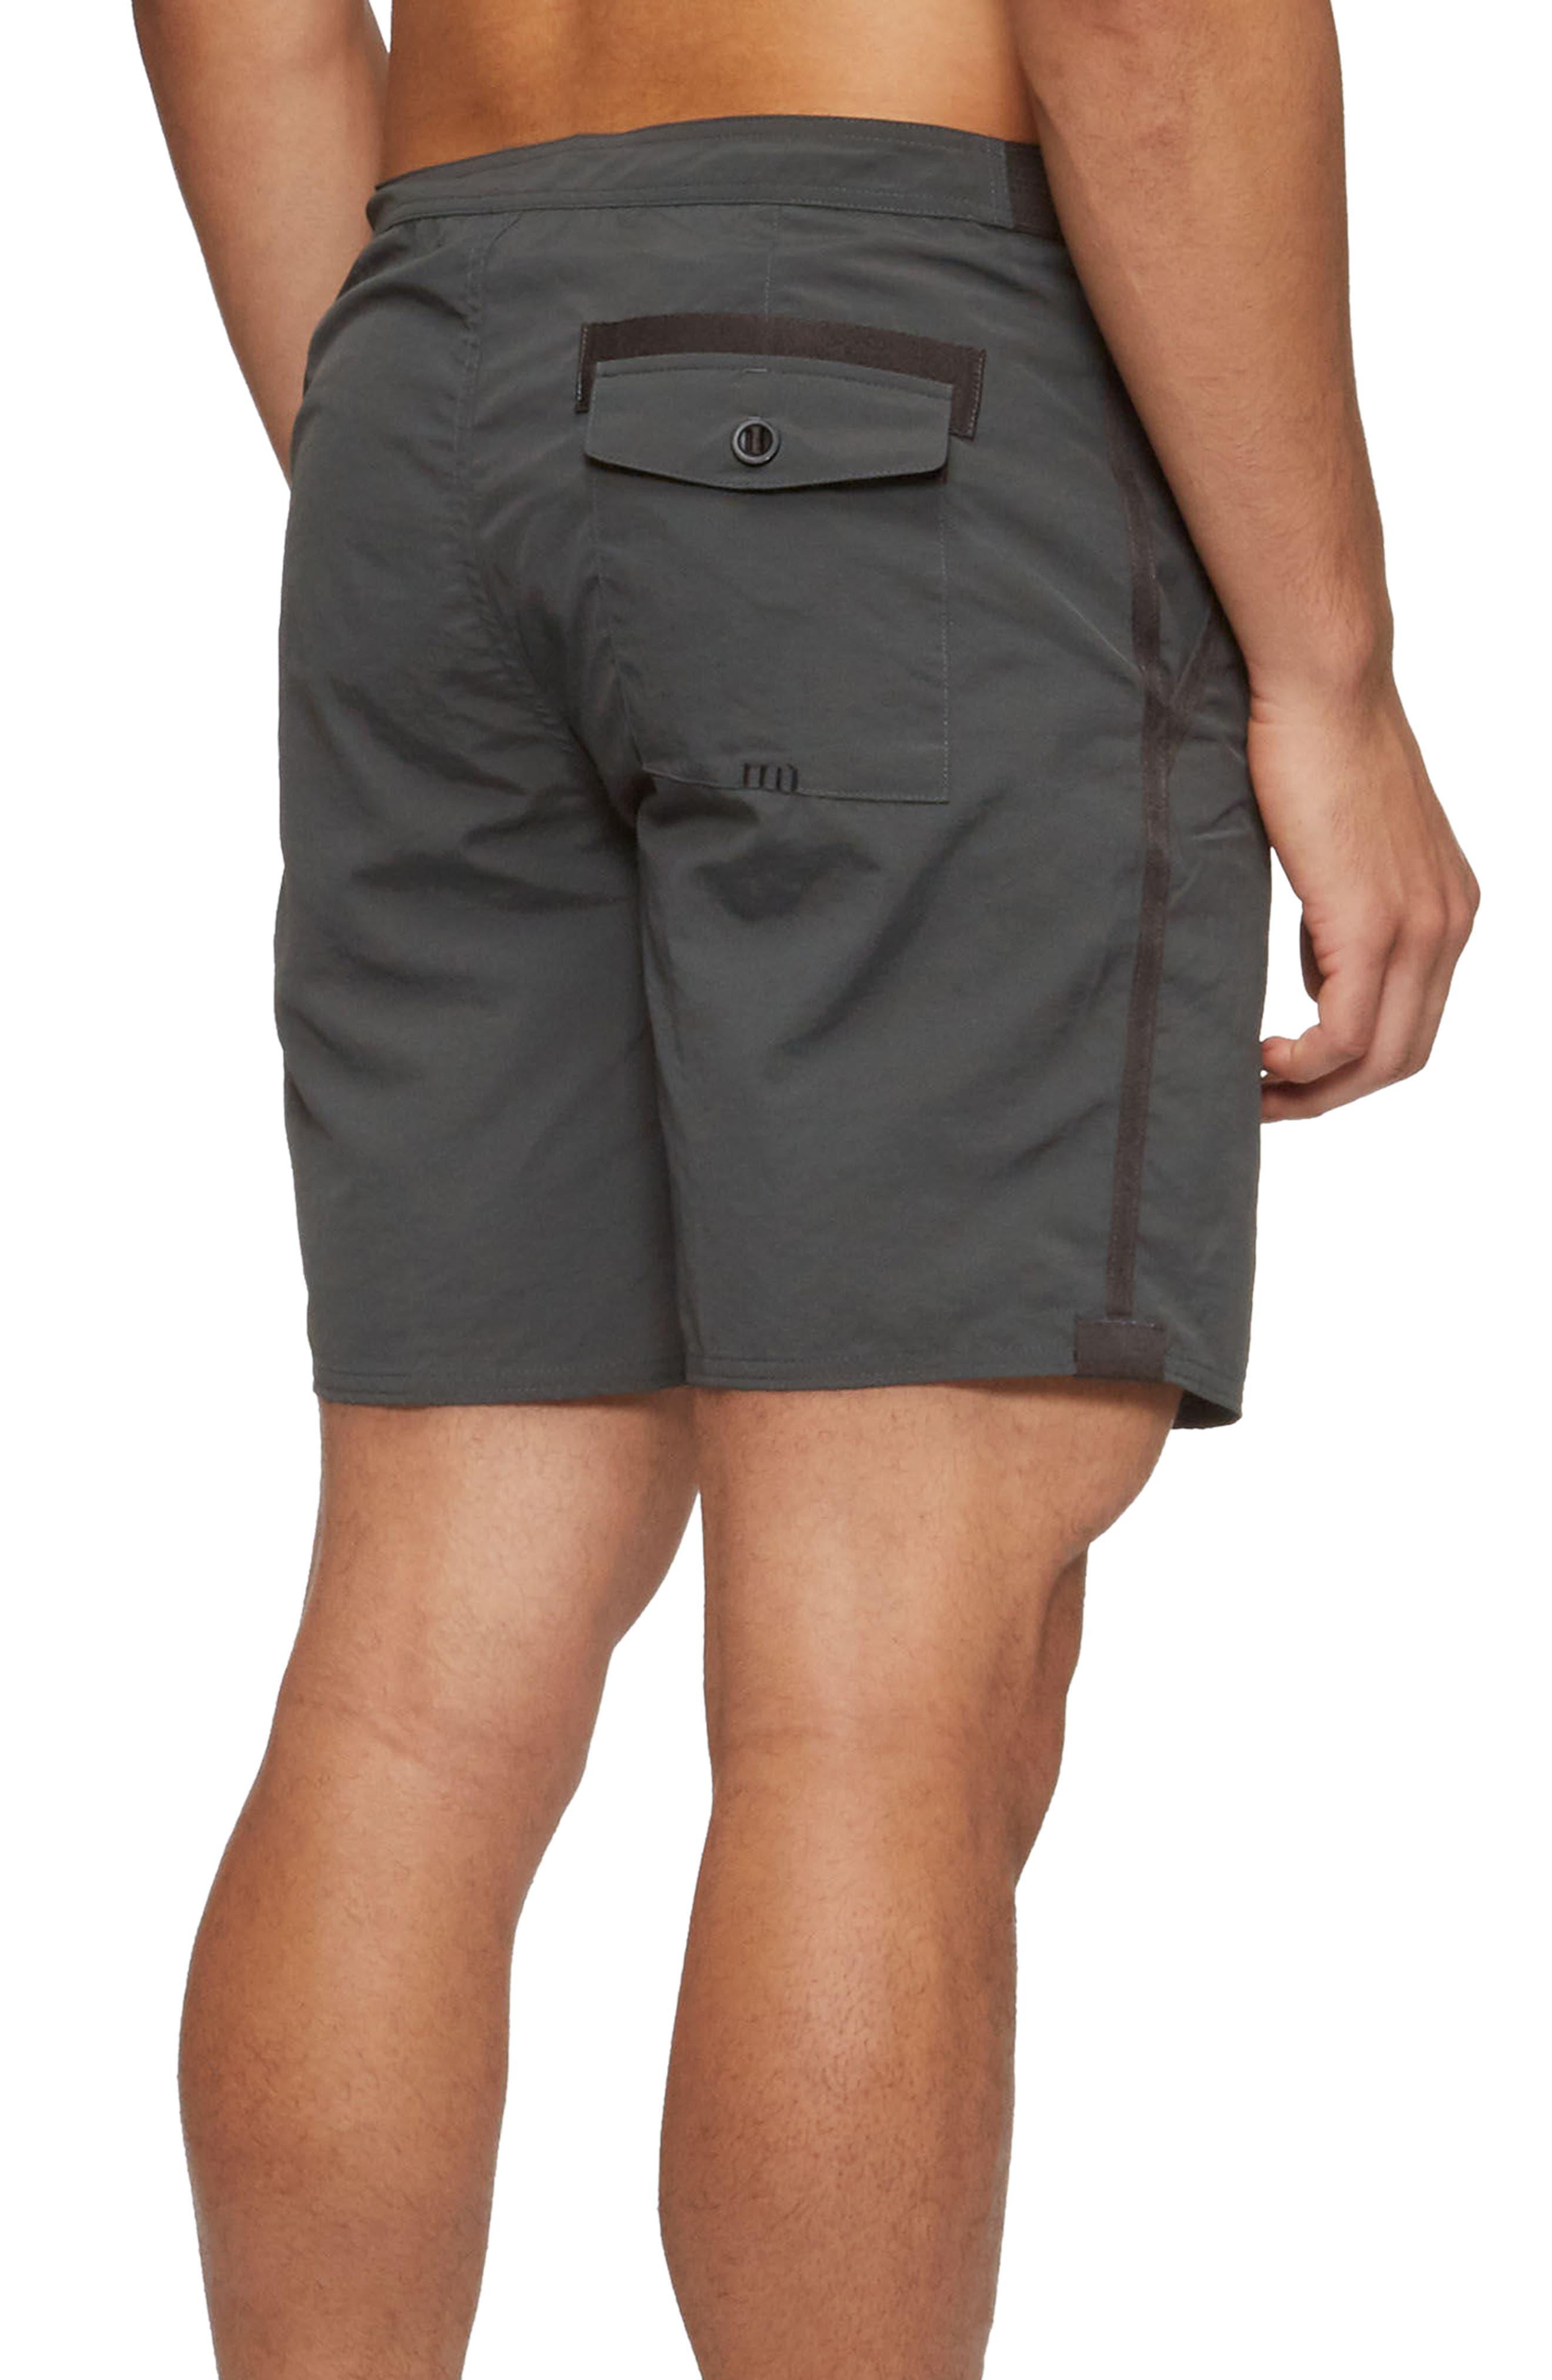 Catera Swim Shorts,                             Alternate thumbnail 2, color,                             COAL CAMO